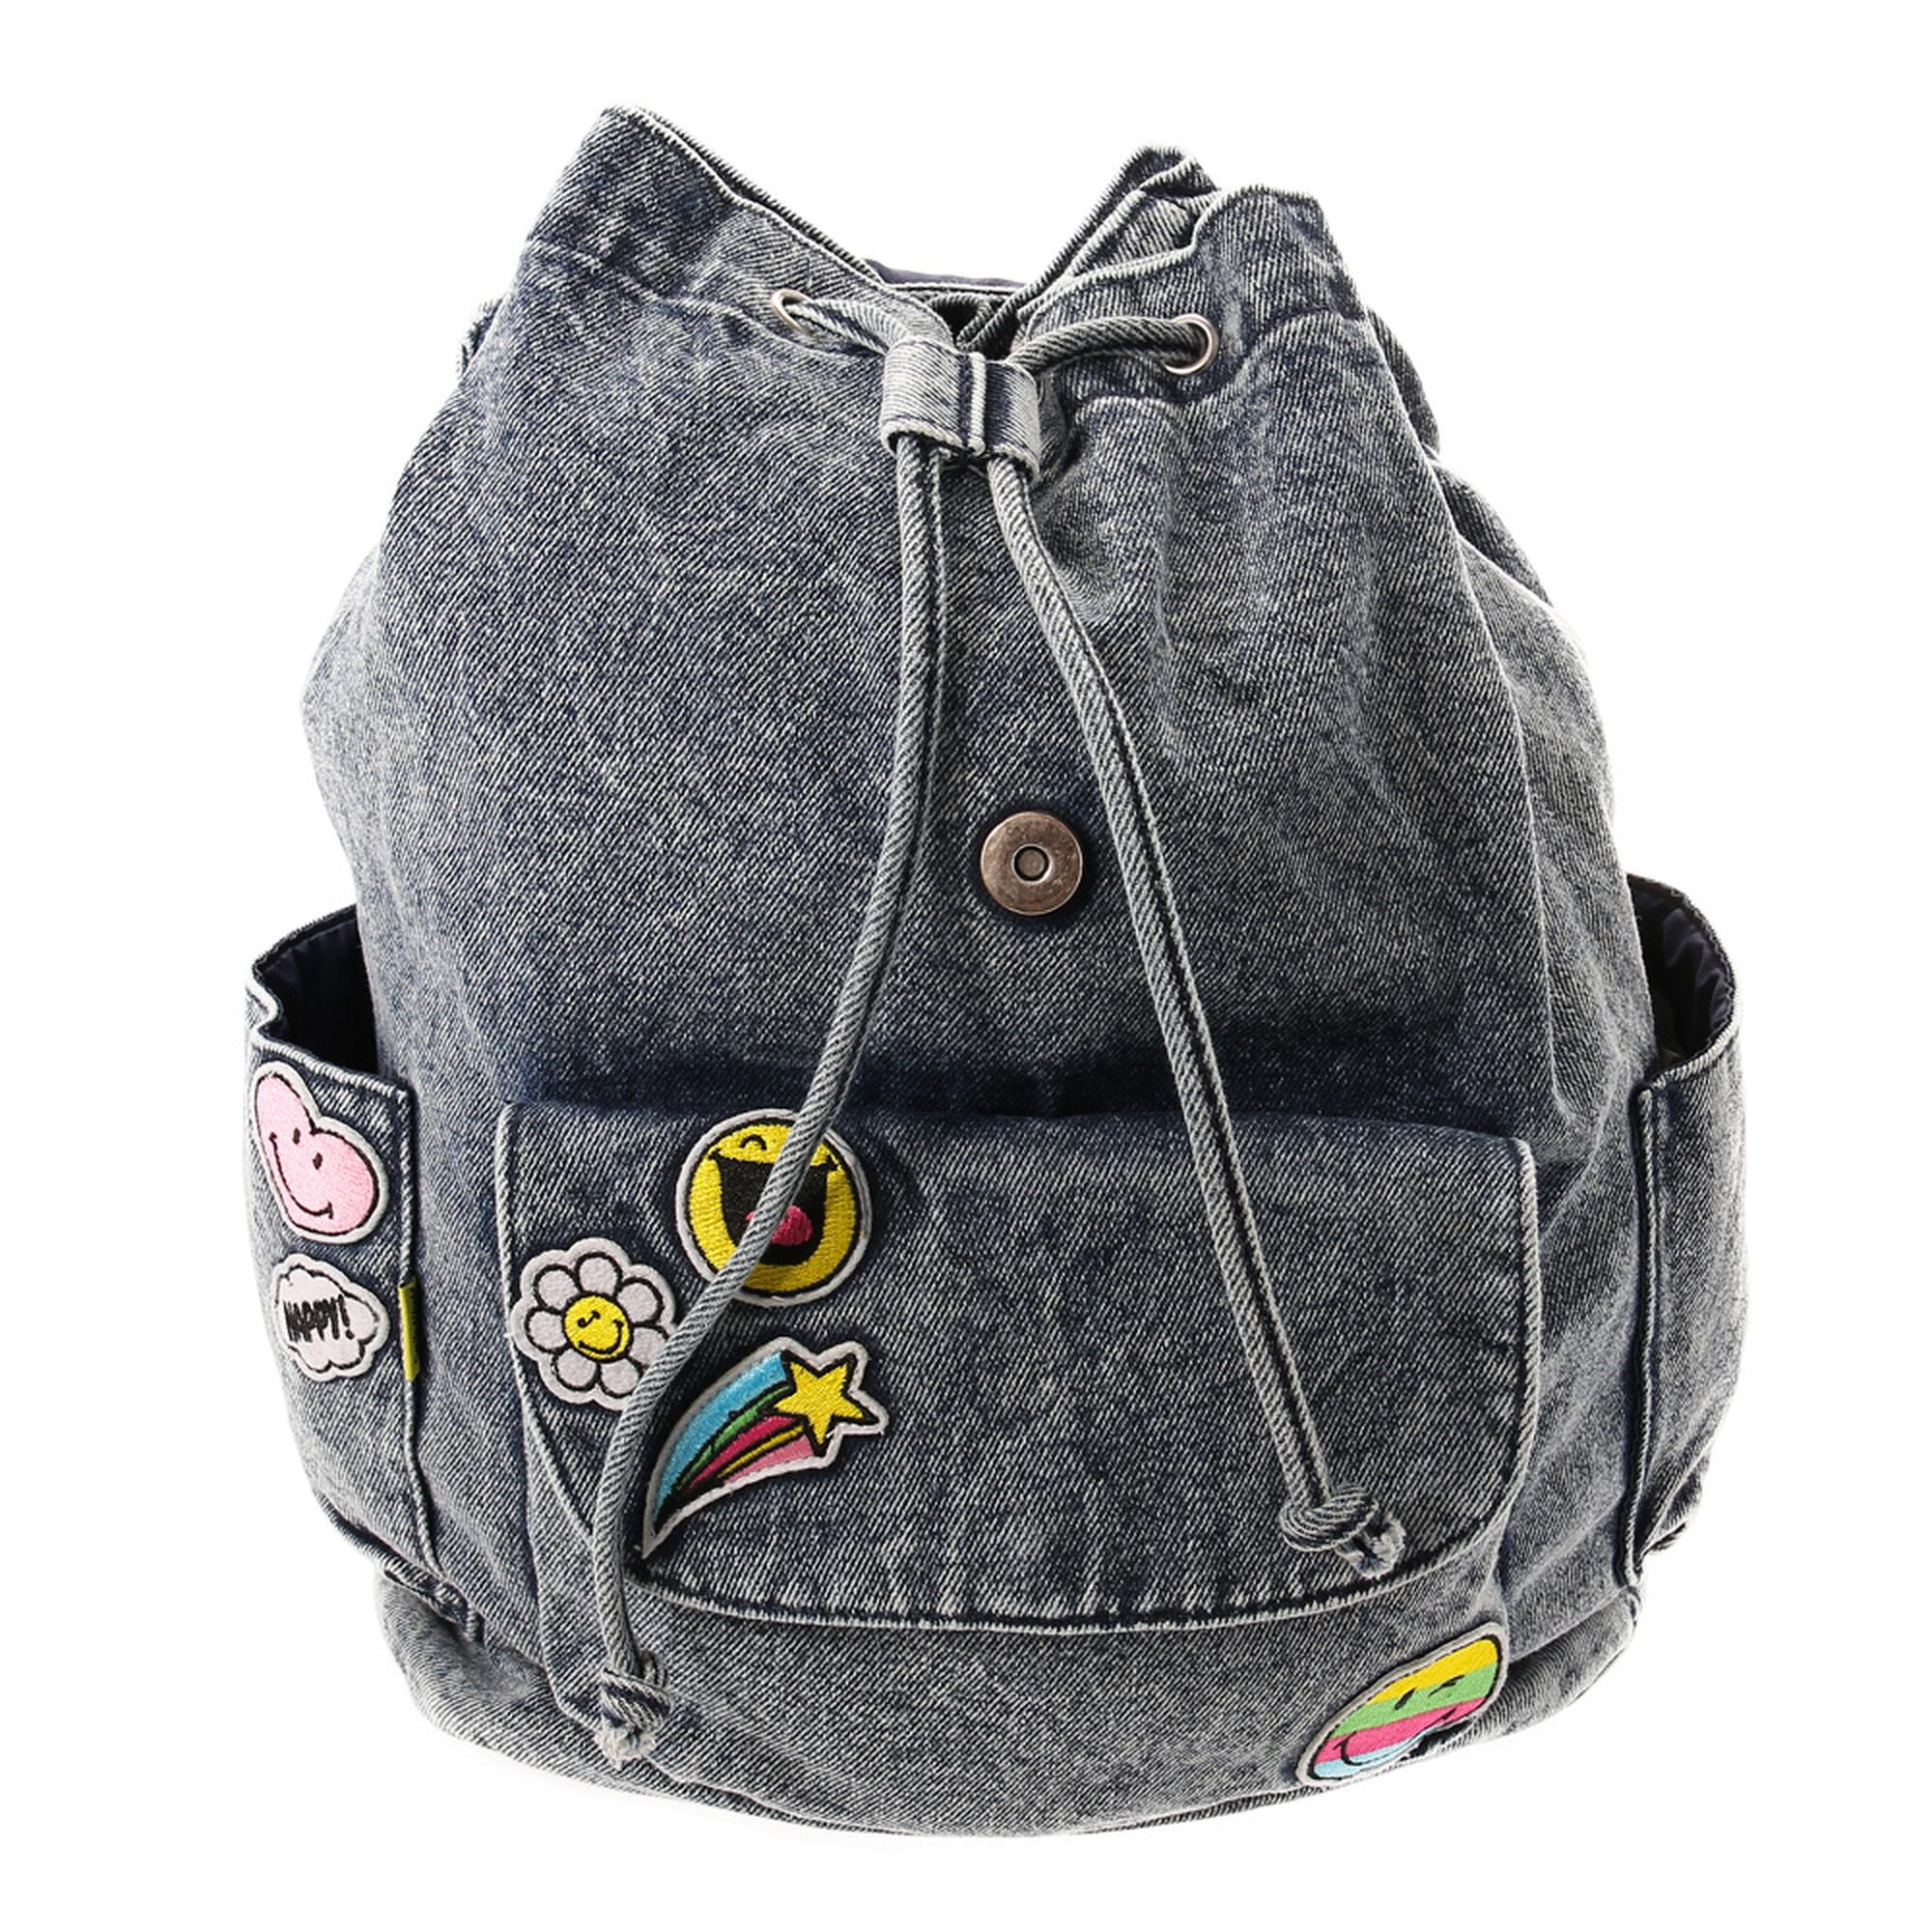 sac dos en jean avec cussons smiley claire 39 s fr. Black Bedroom Furniture Sets. Home Design Ideas